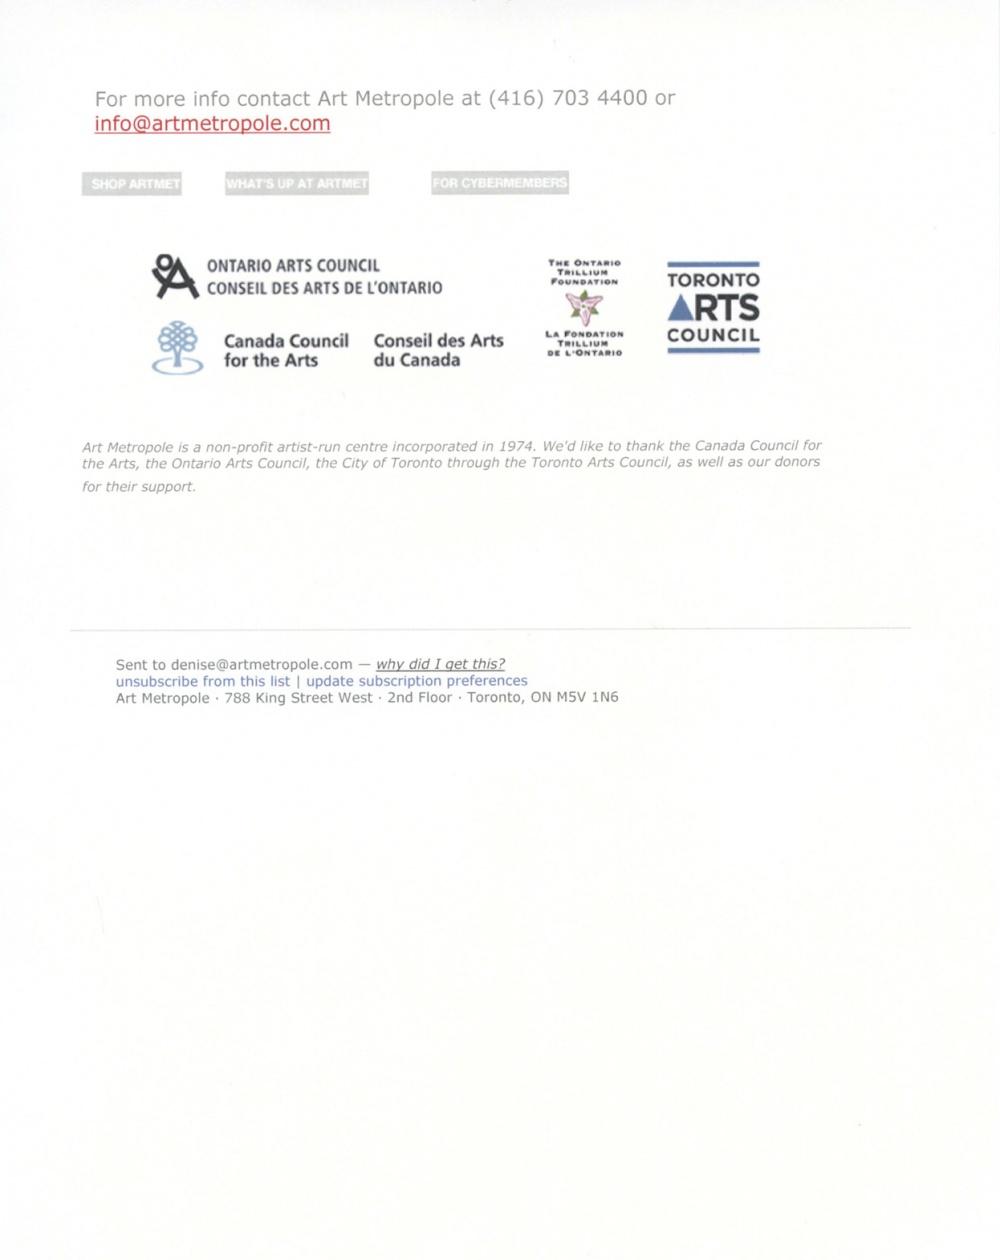 AMA1201.1, page 3